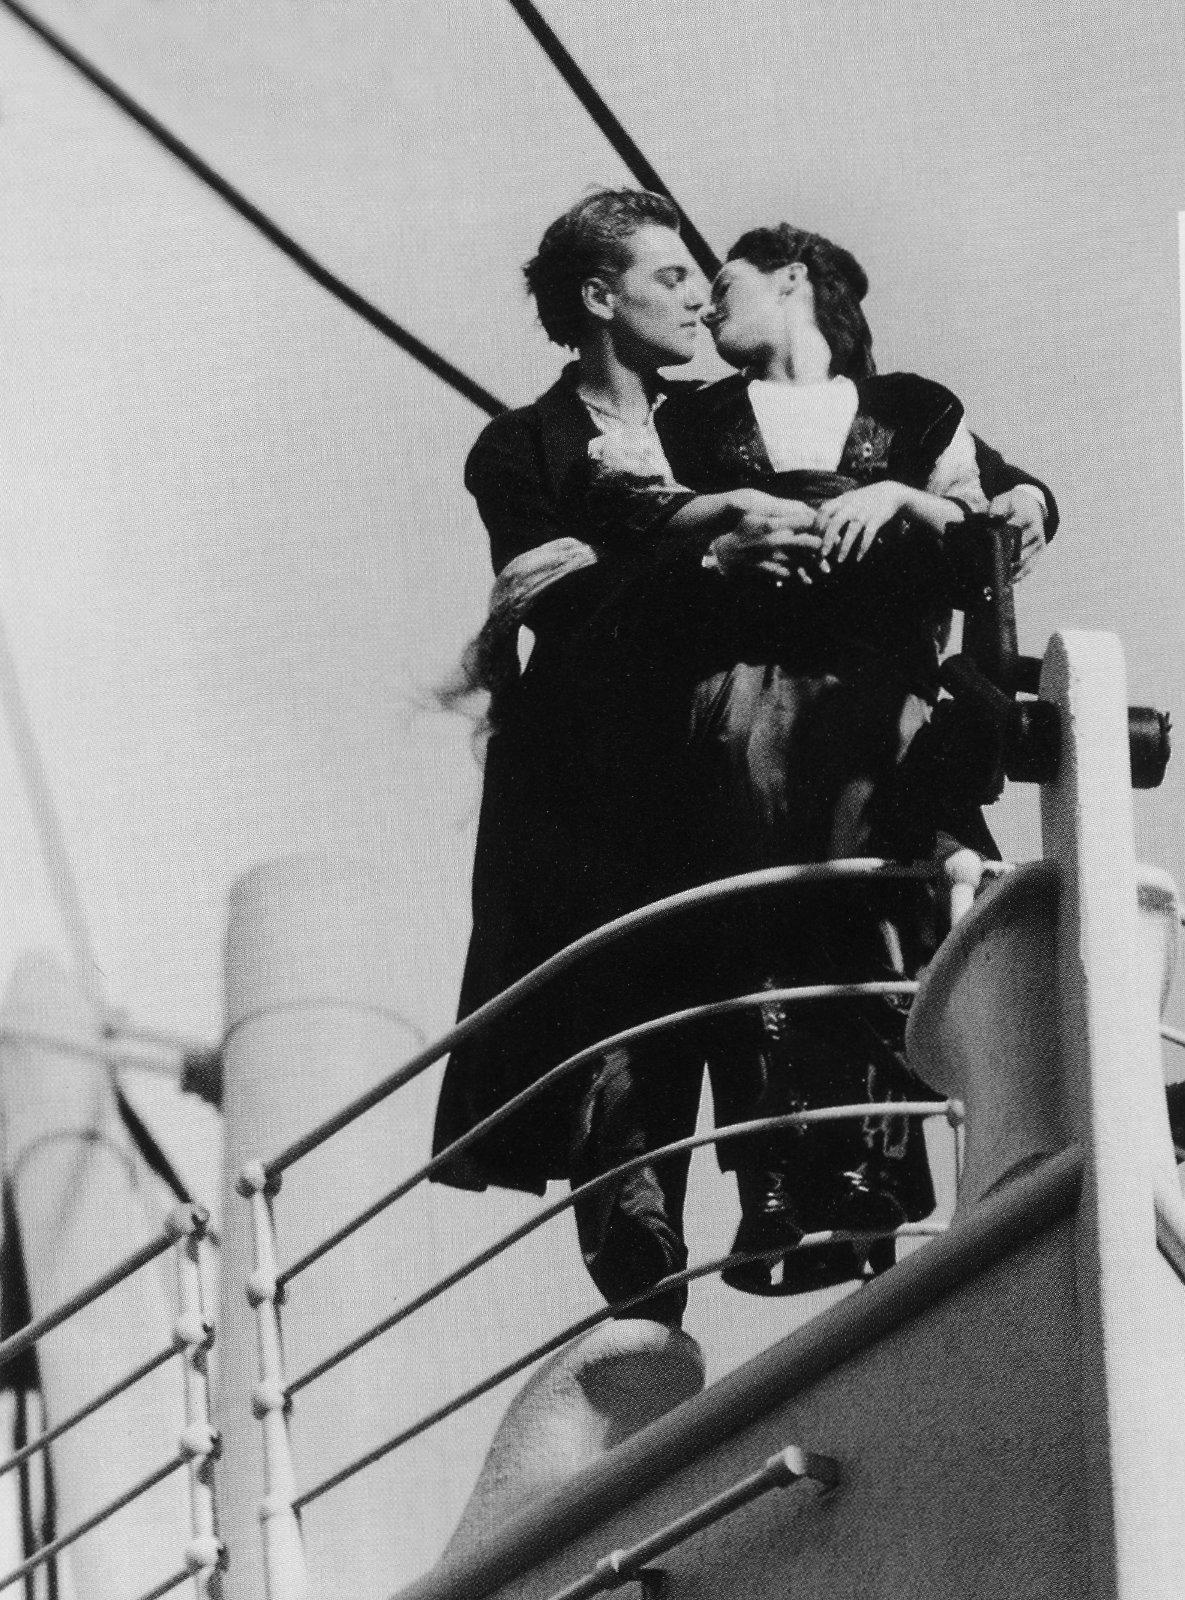 Titanic Promo Stills - Titanic Photo (5692358) - Fanpop